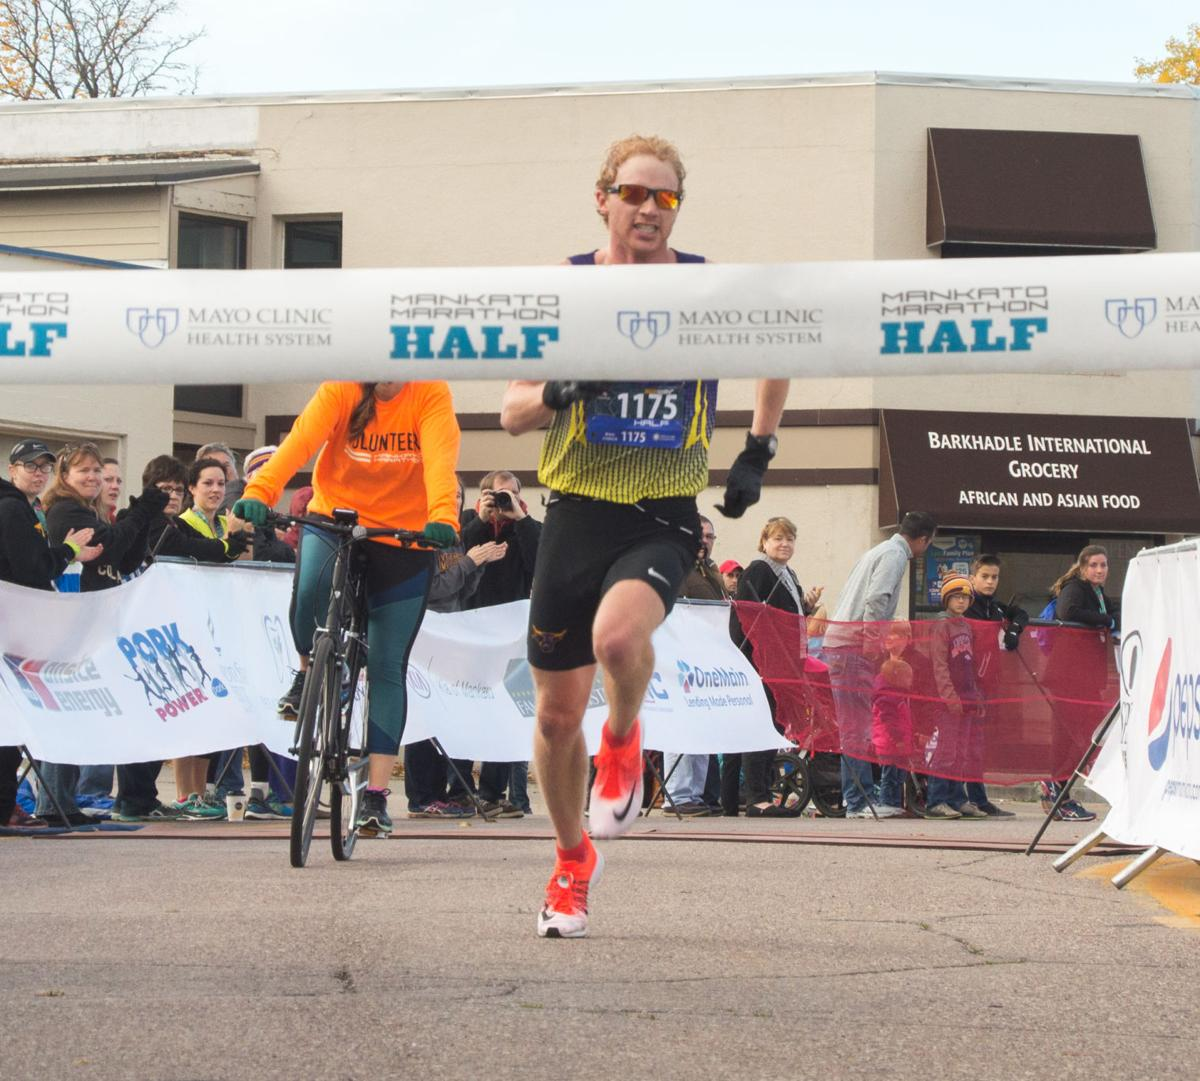 Mankato Marathon _Half_Men's Winner